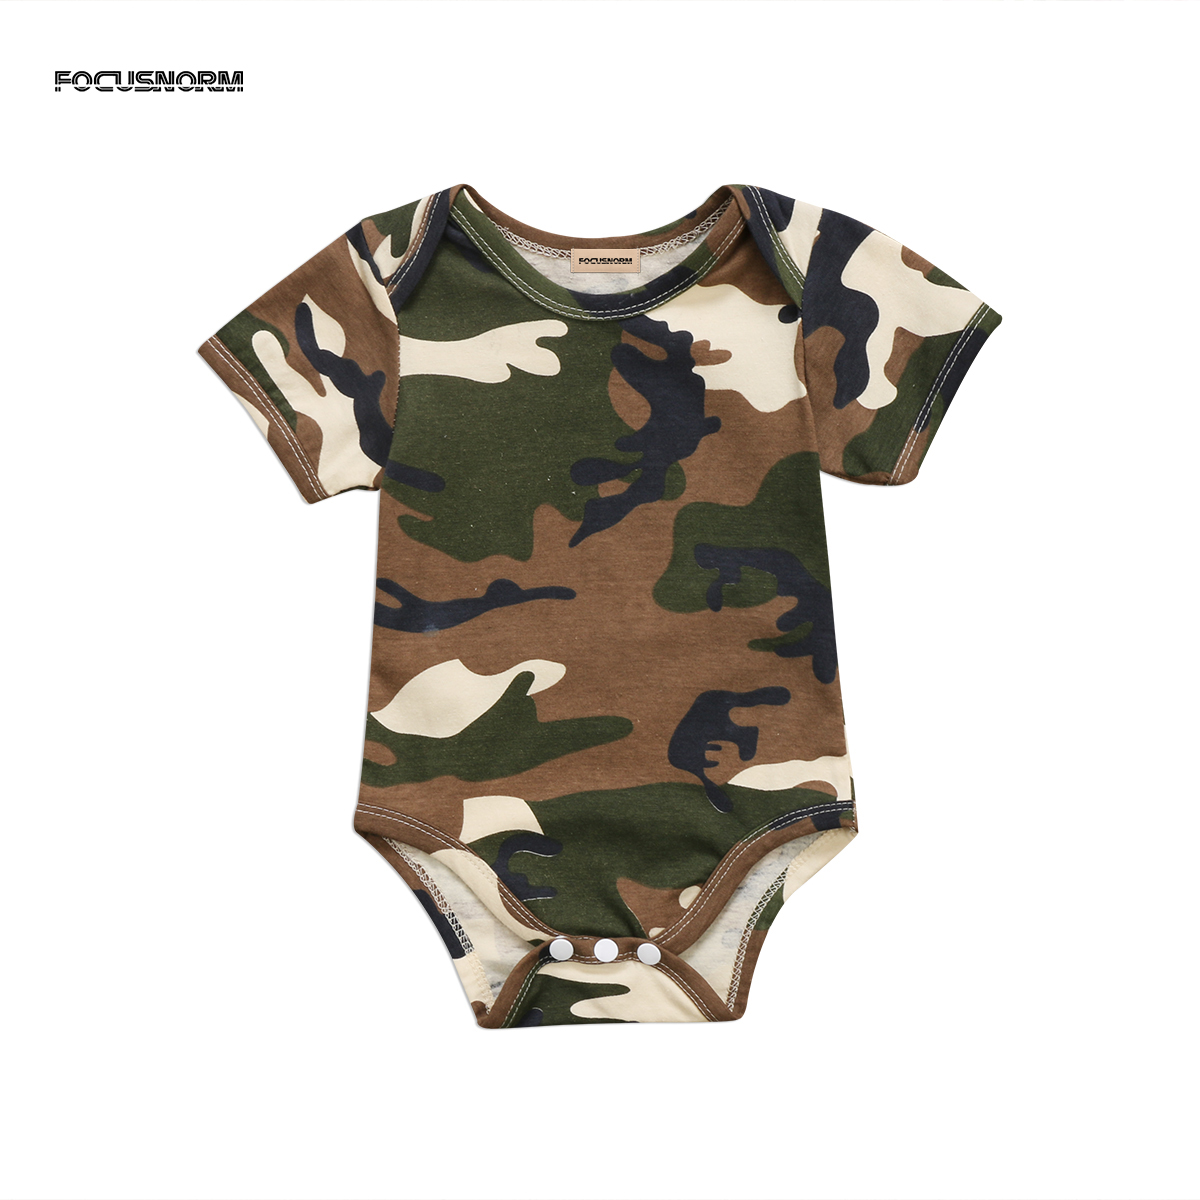 Newborn Baby Girl Summer Cotton Romper Jumpsuit Outfits Clothes Camo Bodysuit